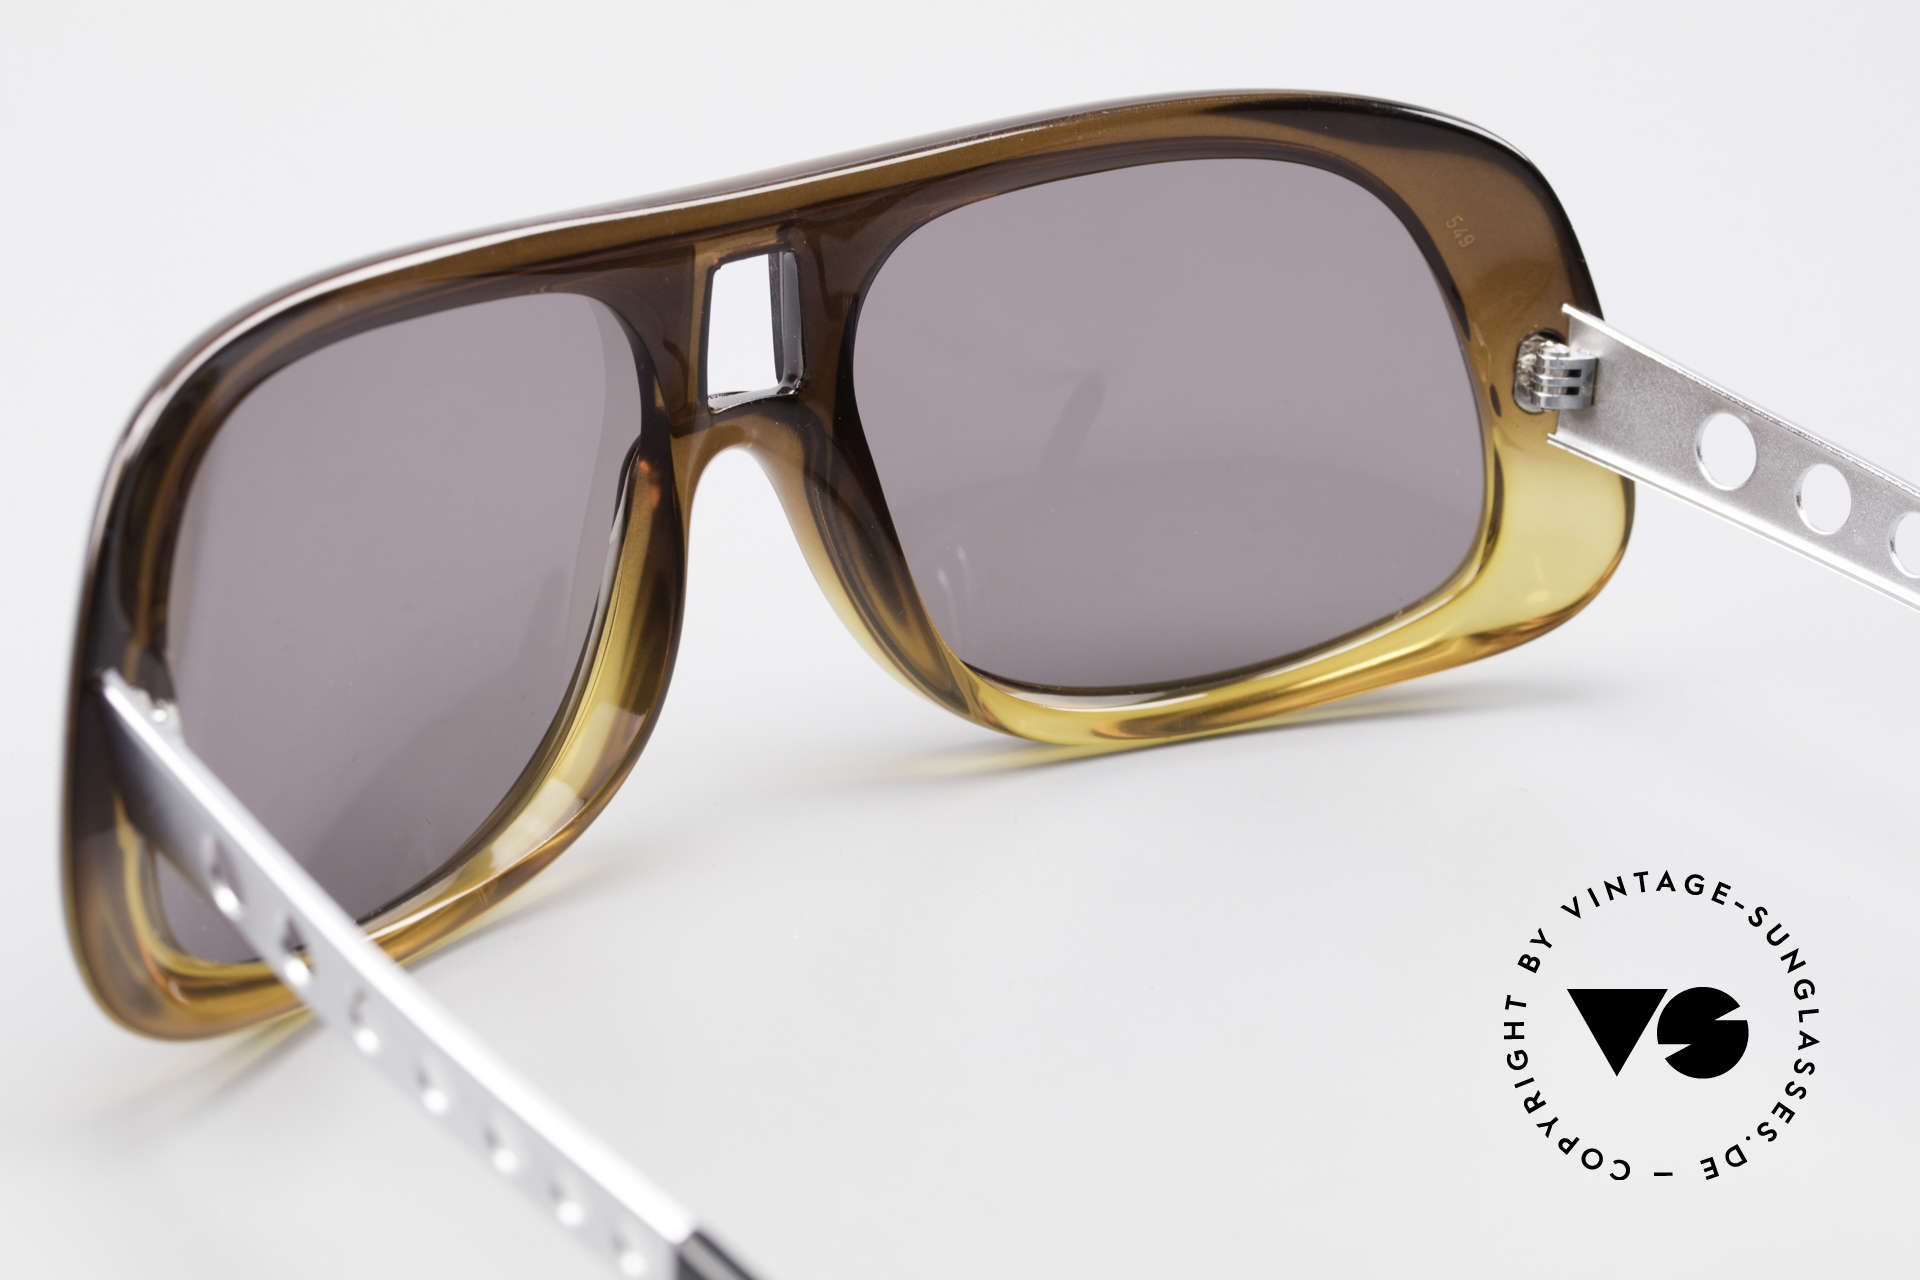 Carrera 549 Leo DiCaprio Movie Sunglasses, legendary Elvis Presley style (distinctive temples), Made for Men